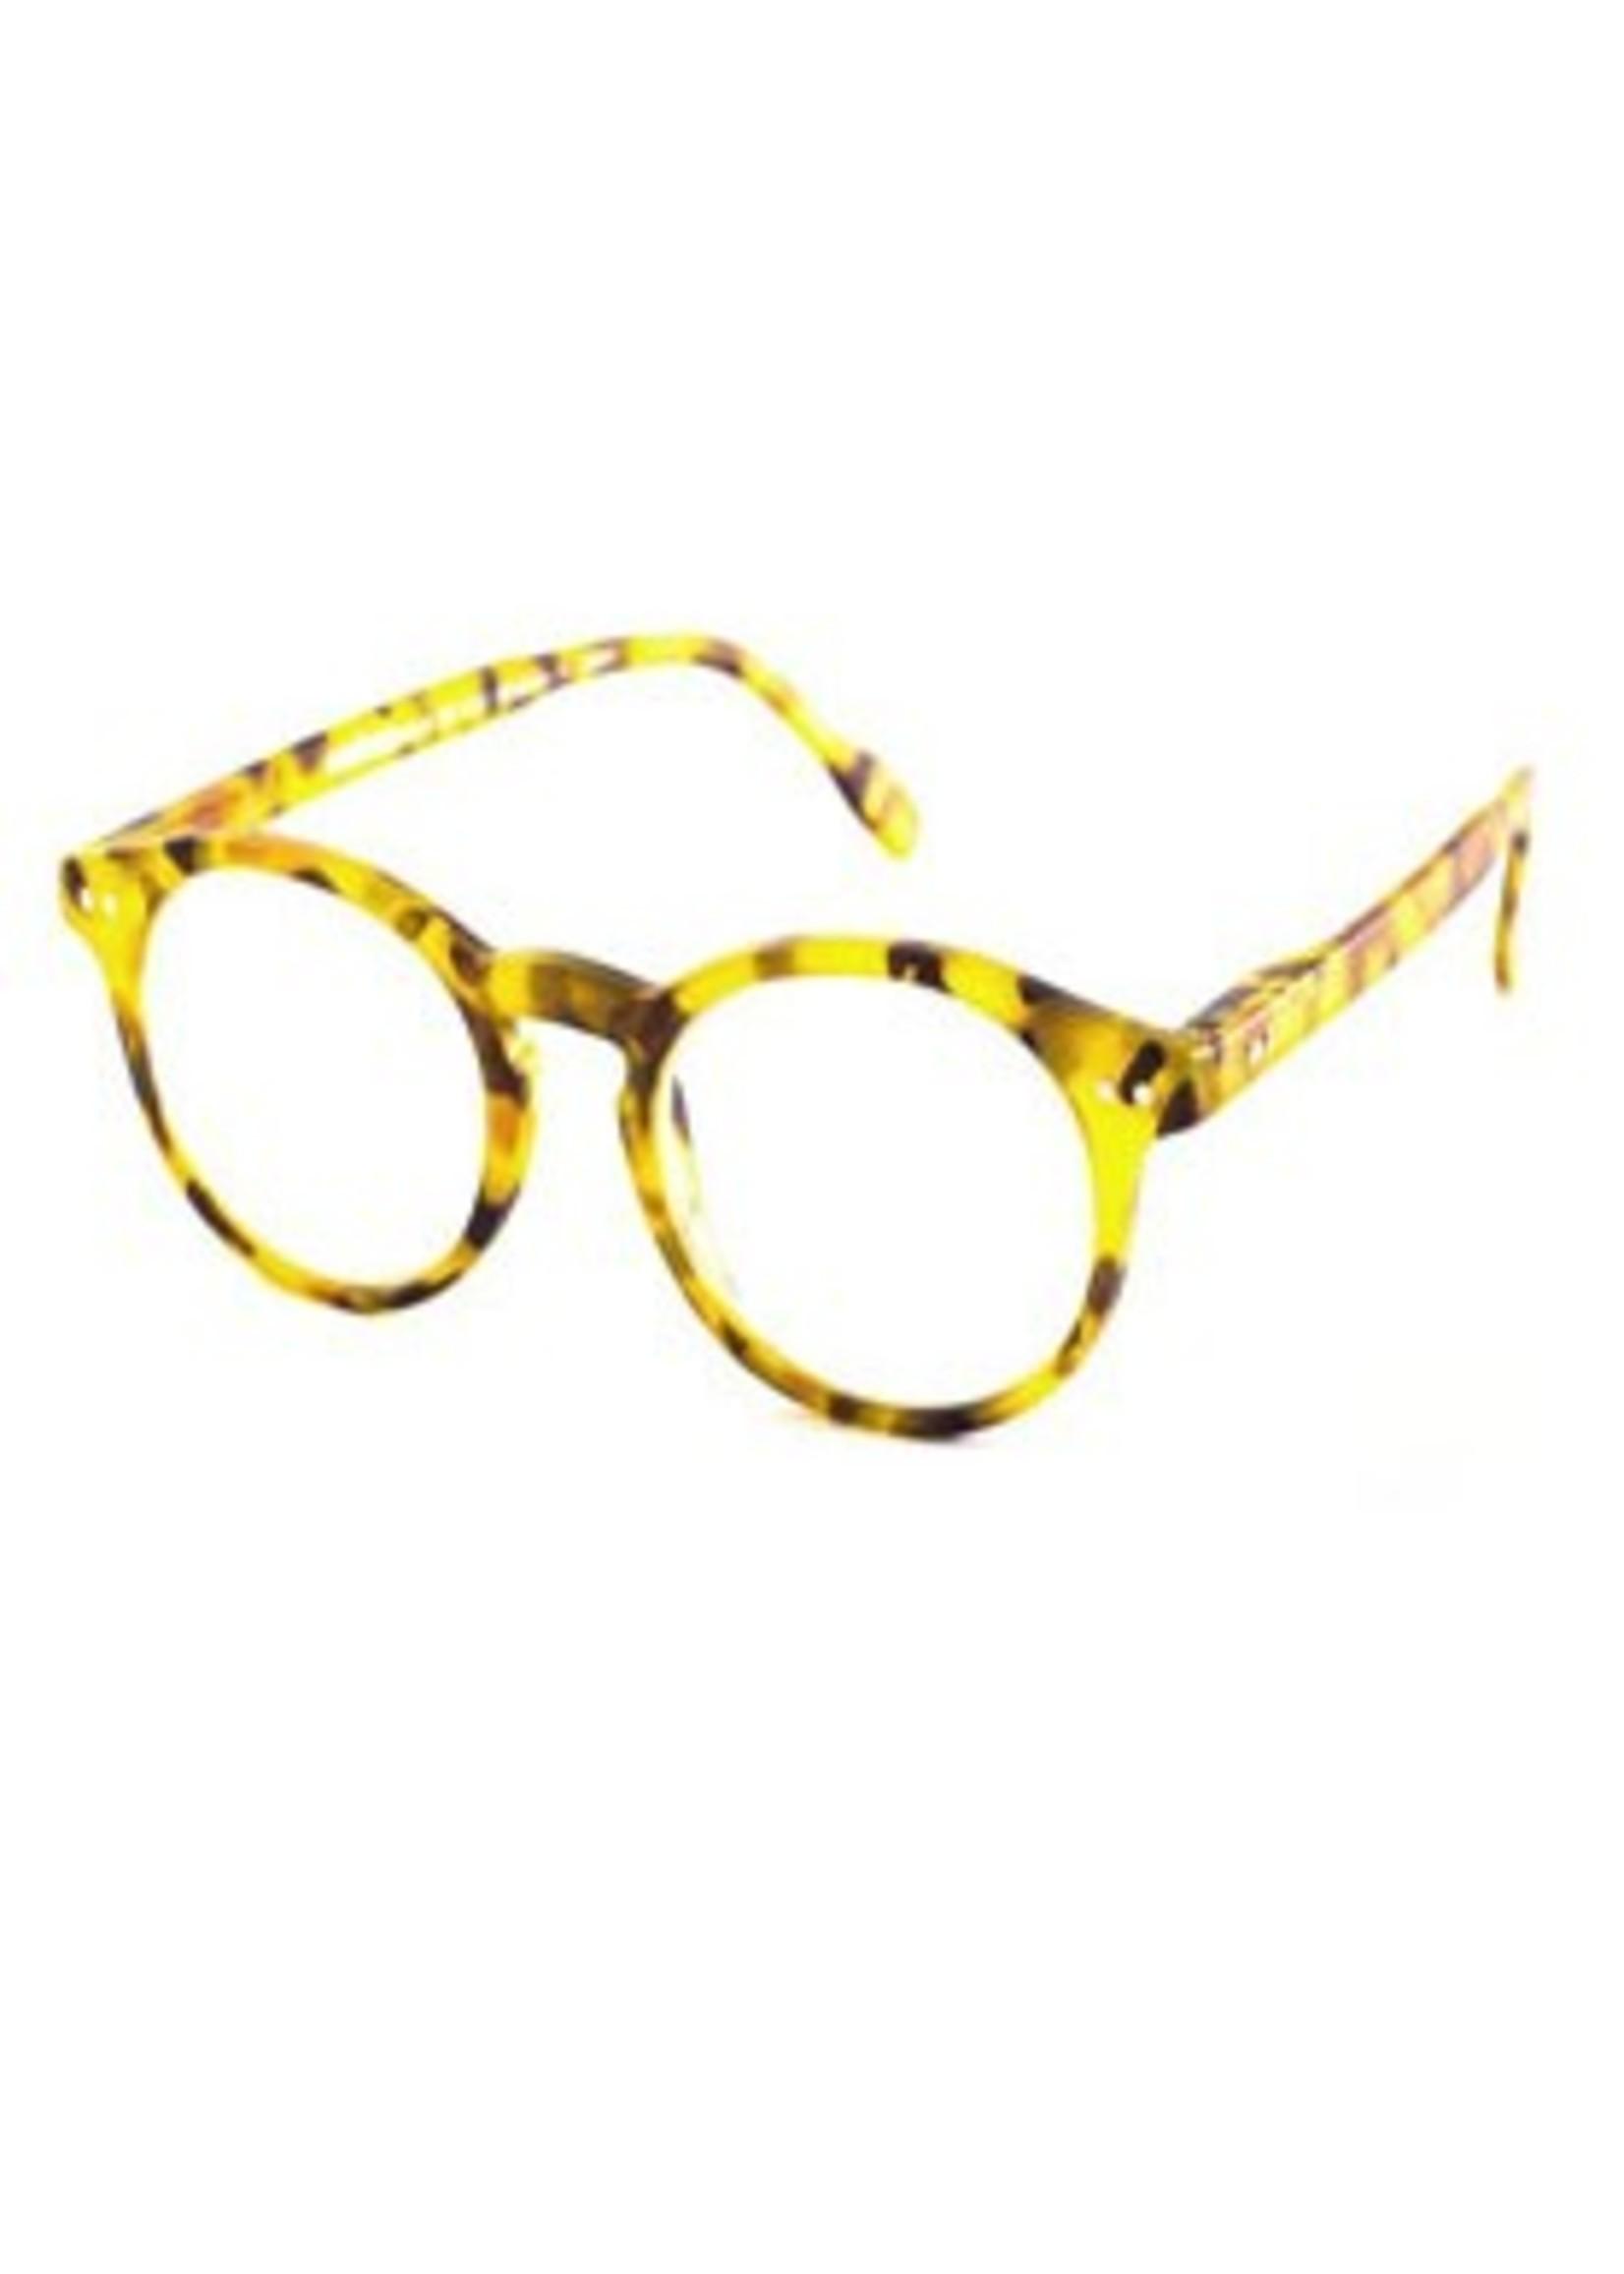 Readloop leesbrillen Leesbril Readloop Tradition Blond Havanna 2601-04